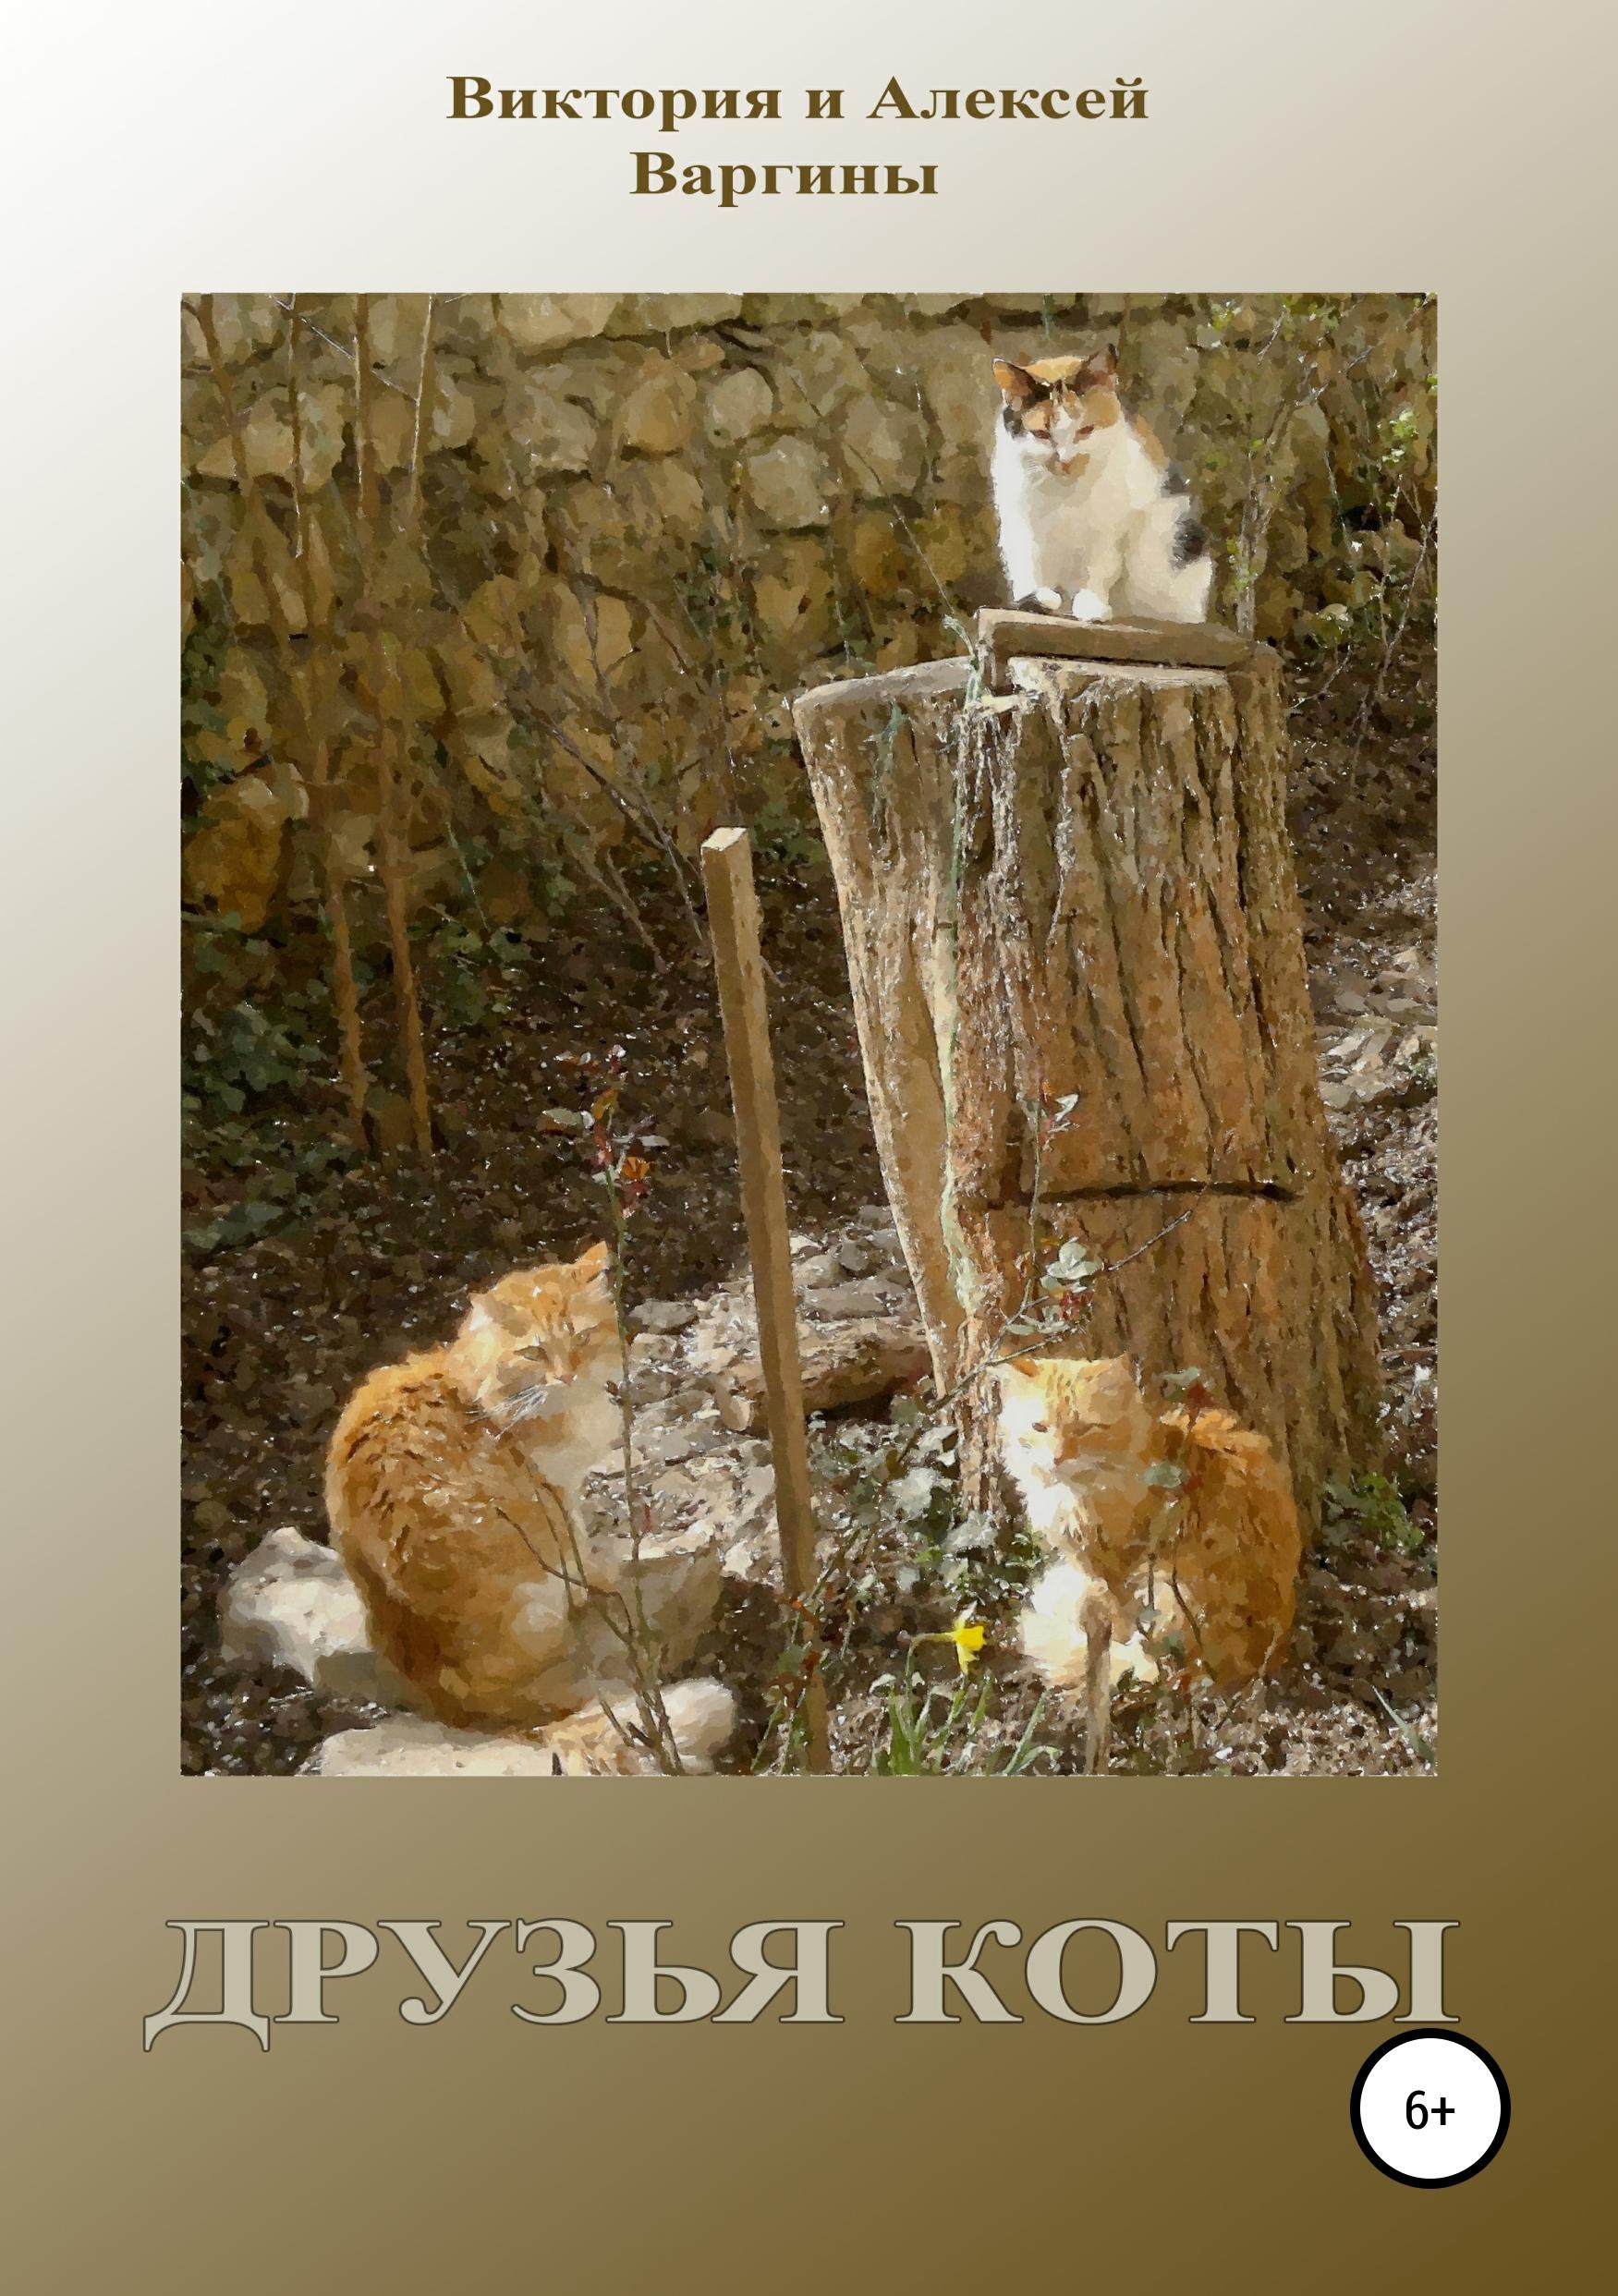 Друзья коты